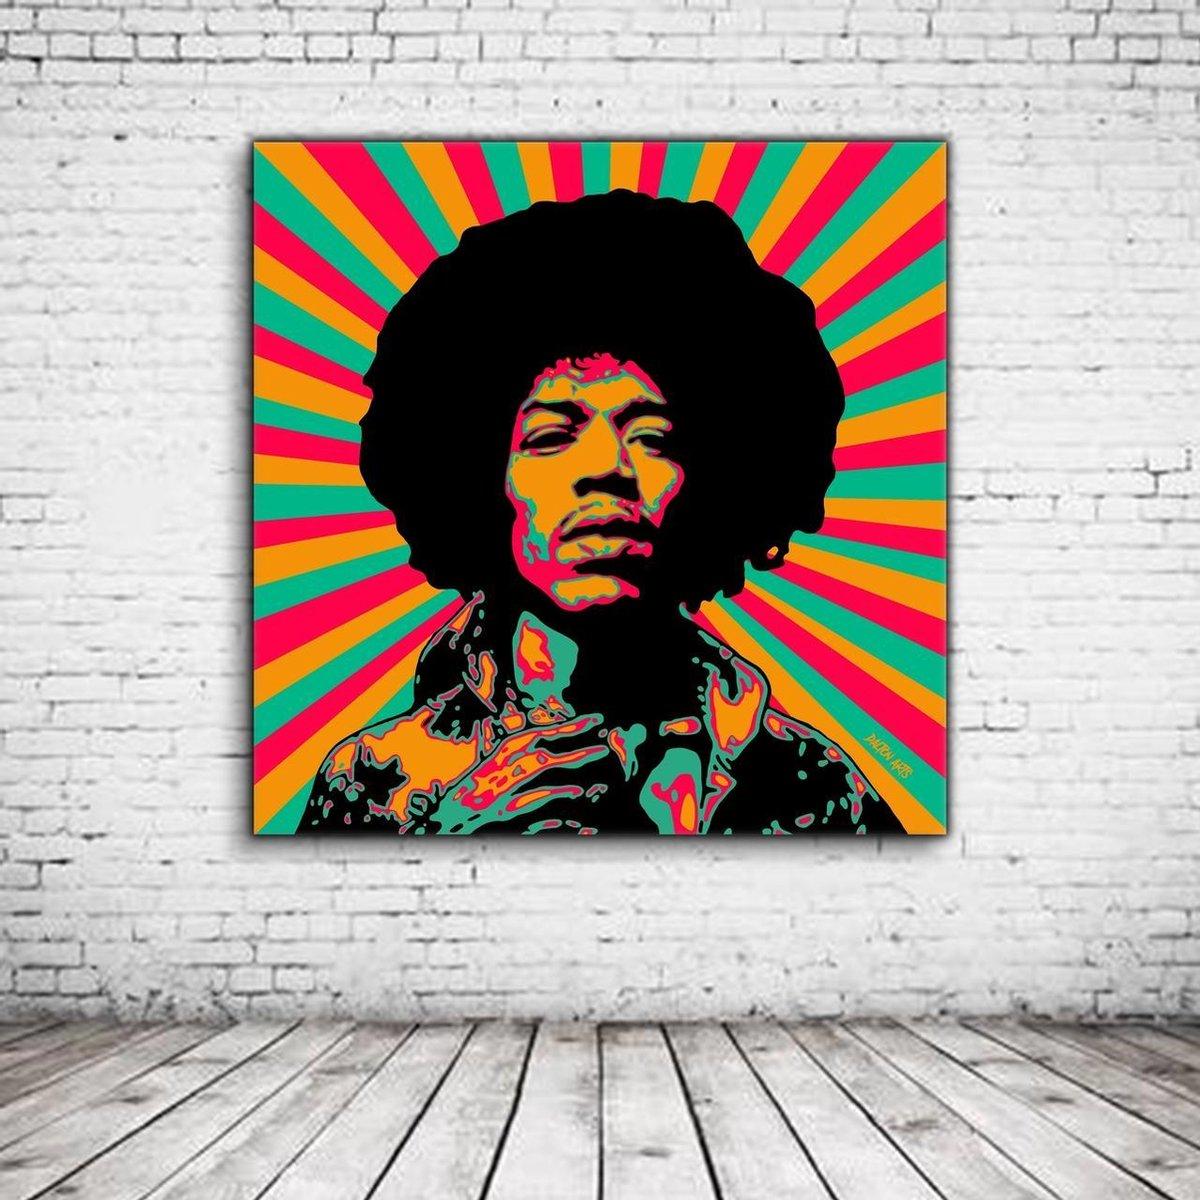 Pop Art Jimi Hendrix Poster - 90 x 90 cm Fotopapier Mat 180 gr - Popart Wanddecoratie